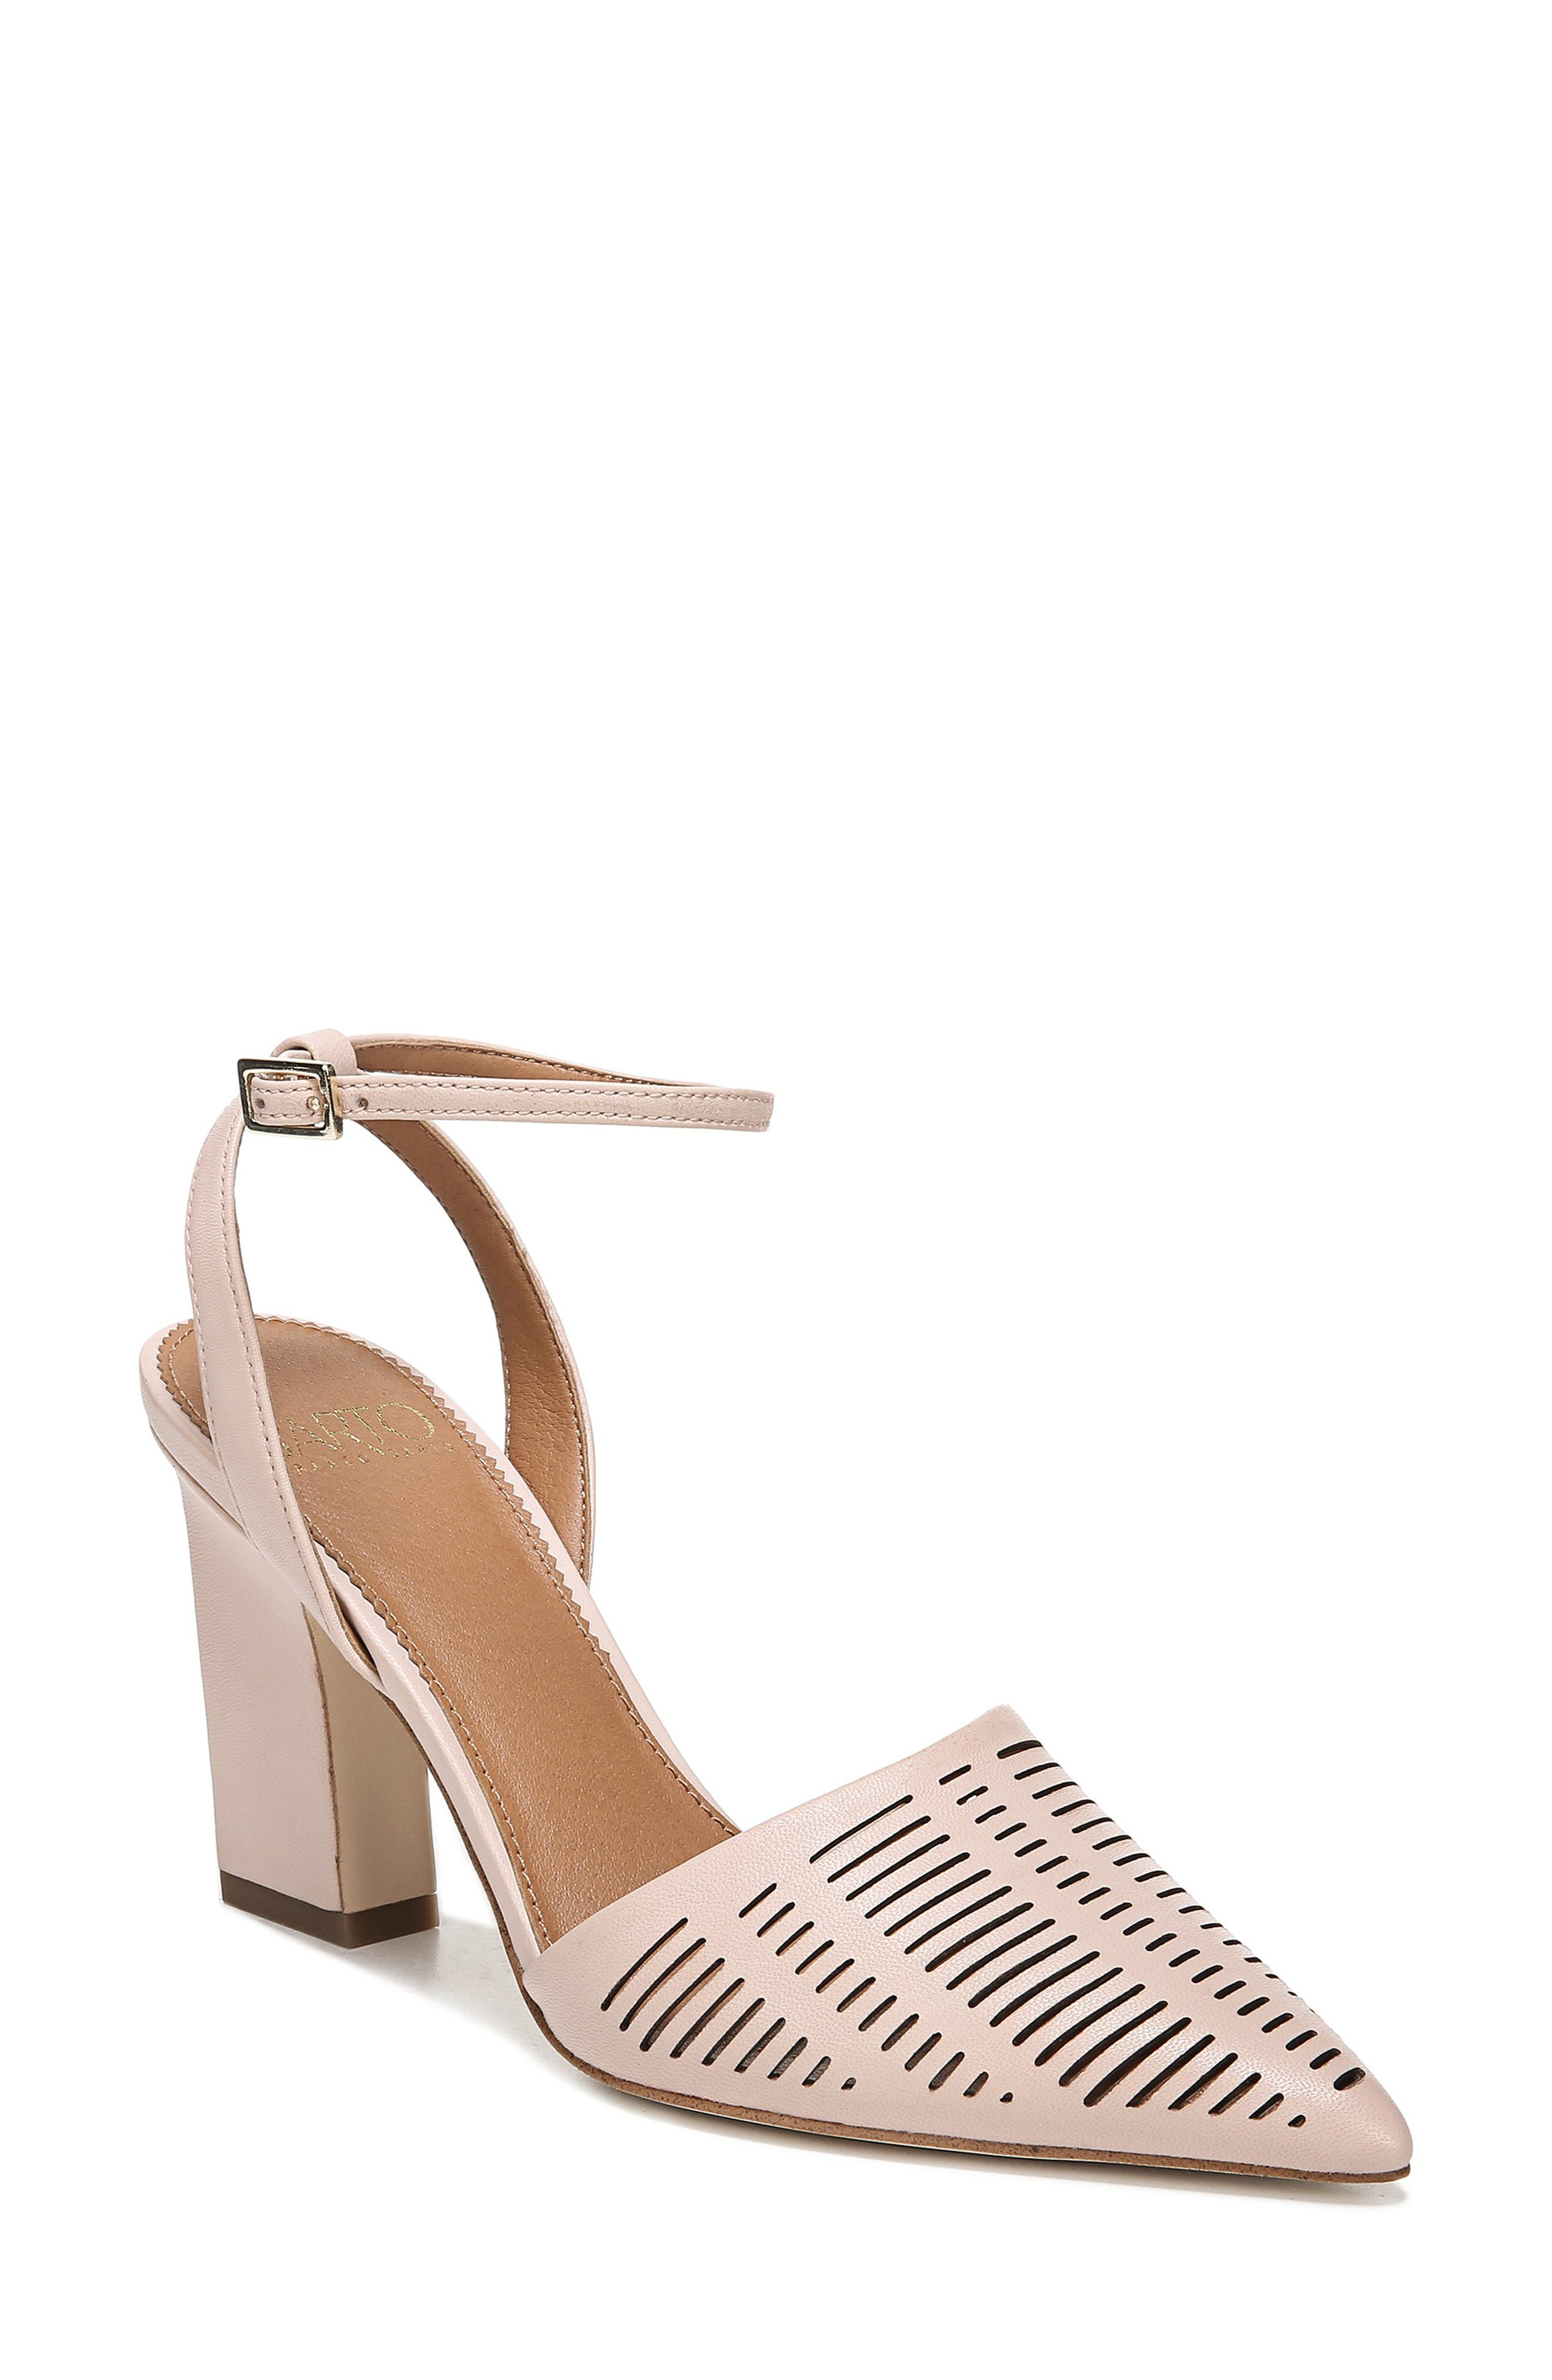 Sarto By Franco Sarto Starla Ankle Strap Pump- Pink